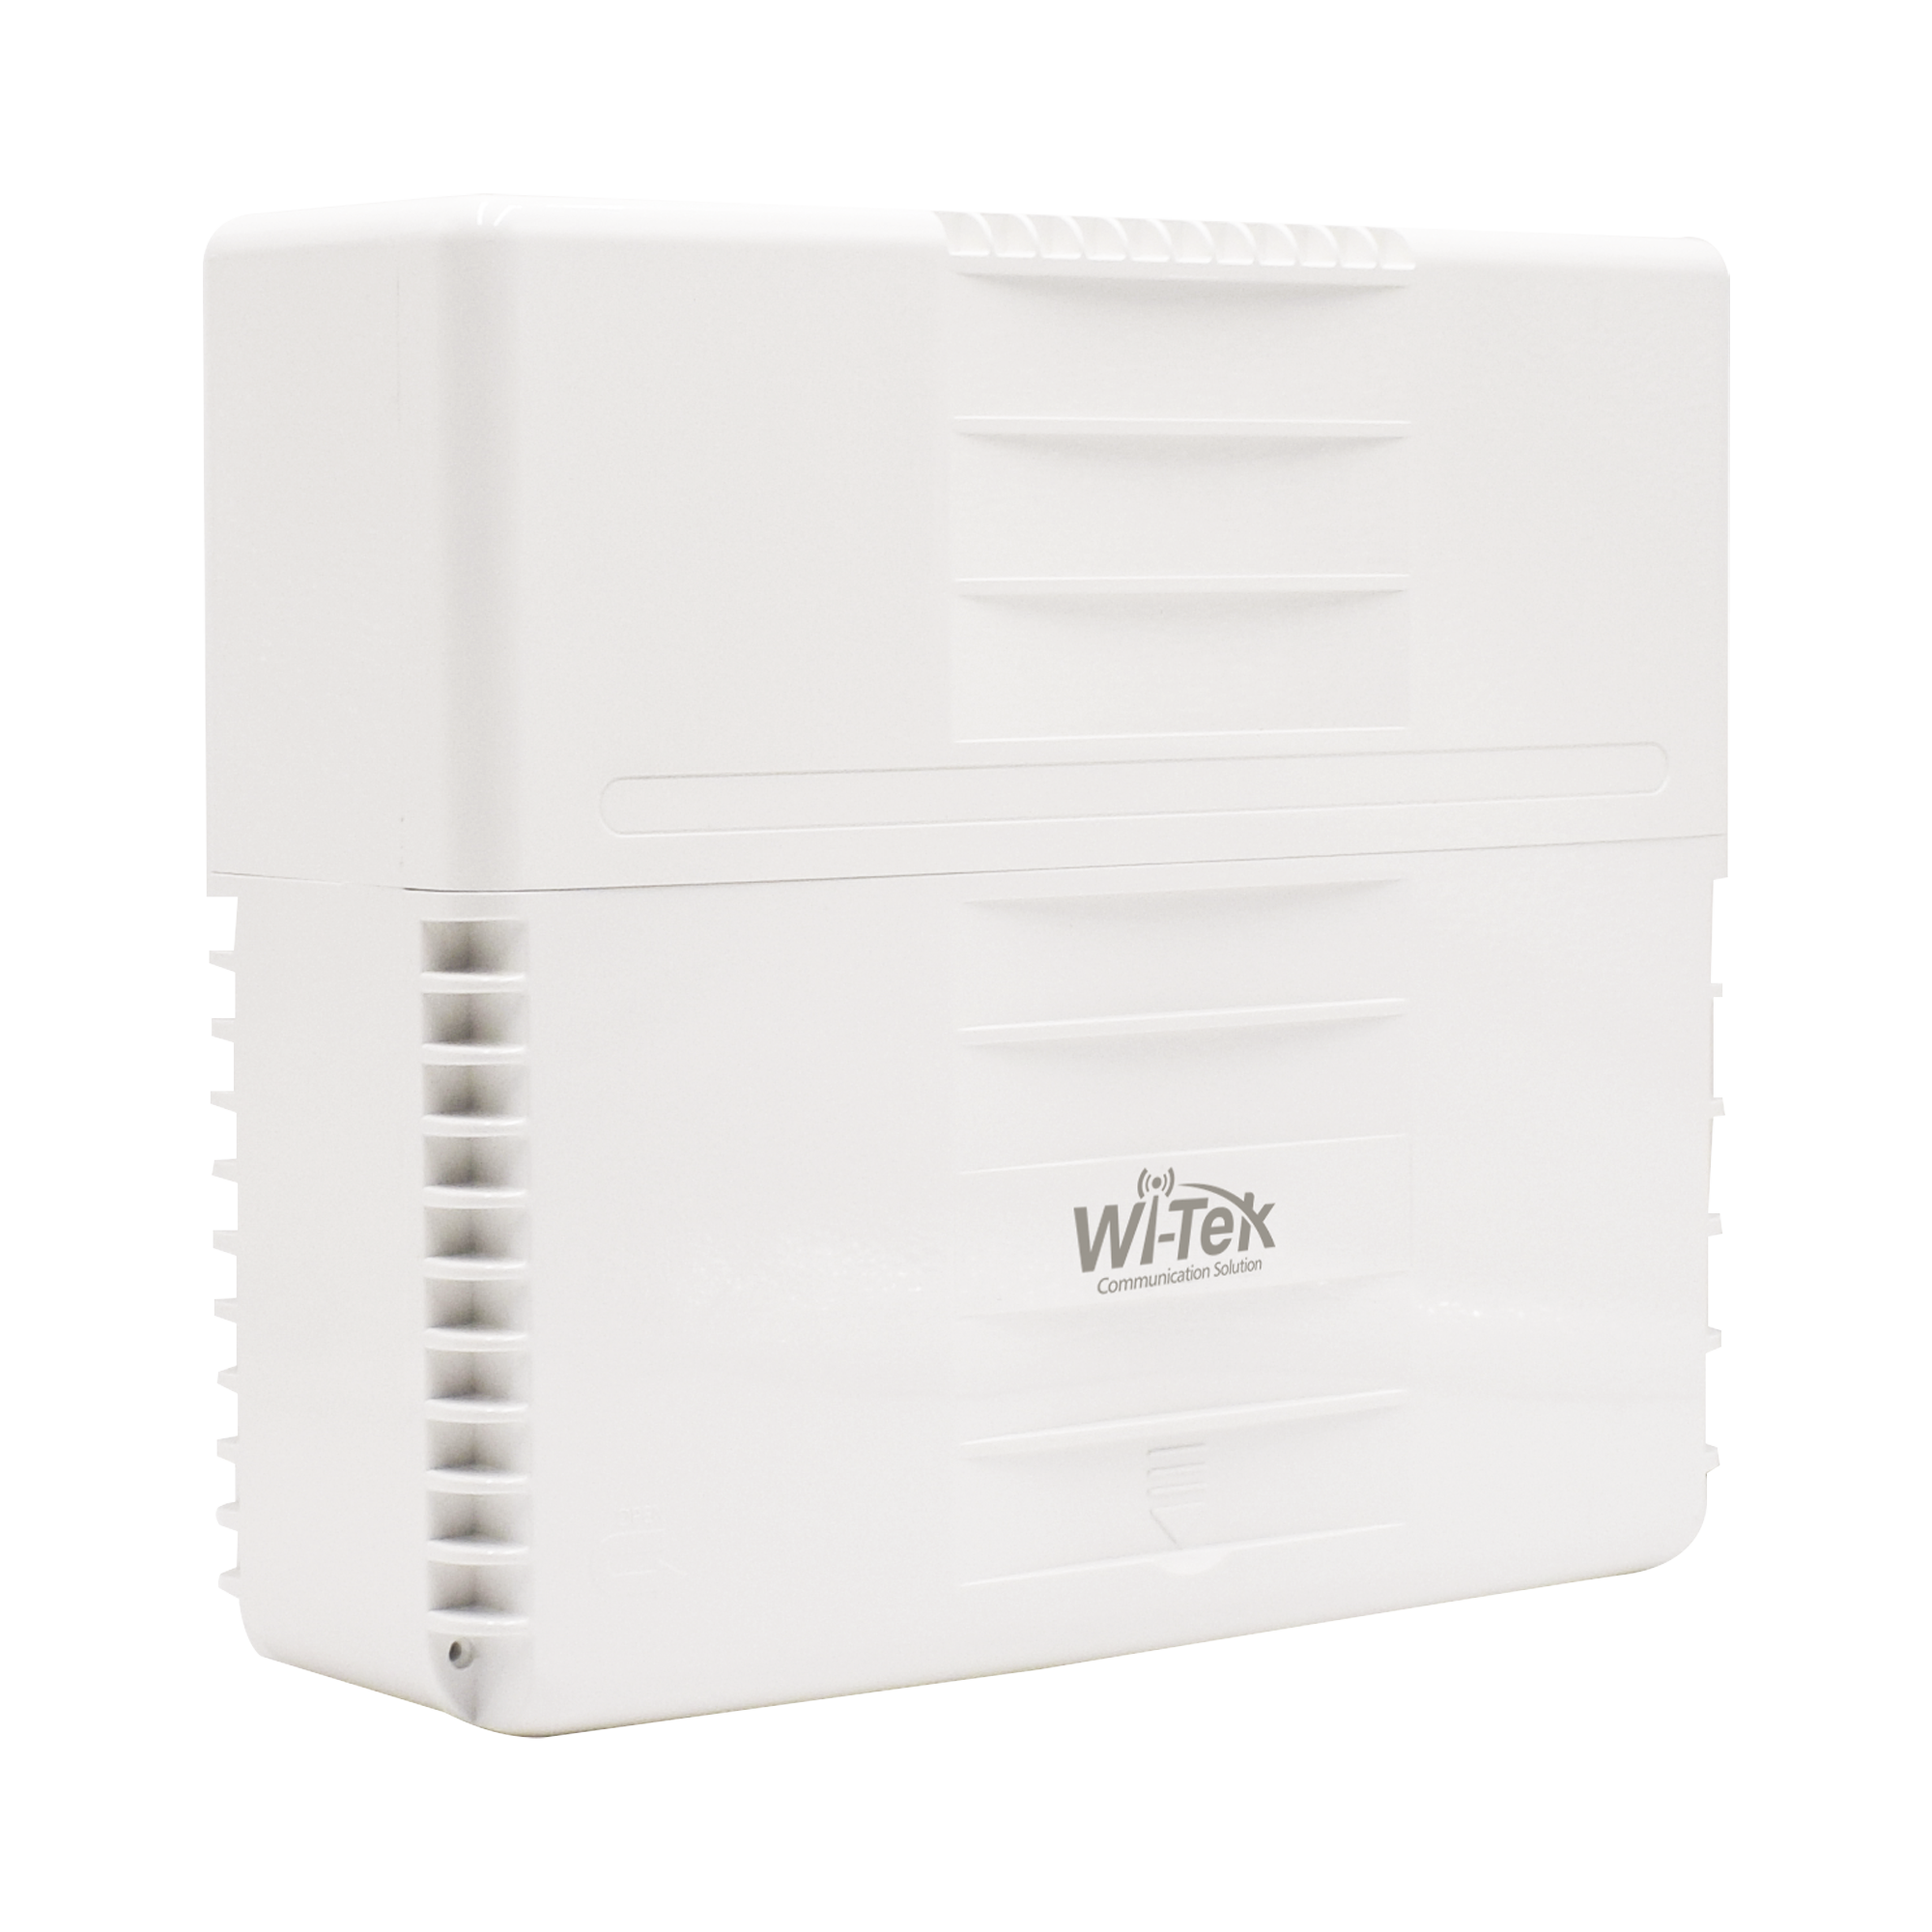 Switch PoE para exterior no administrable, con 8 puertos PoE (6 x fast ethernet + 2 x Gigabit), 3 puertos Uplink gigabit (2 puertos RJ45 + 1 puerto SFP), 120W